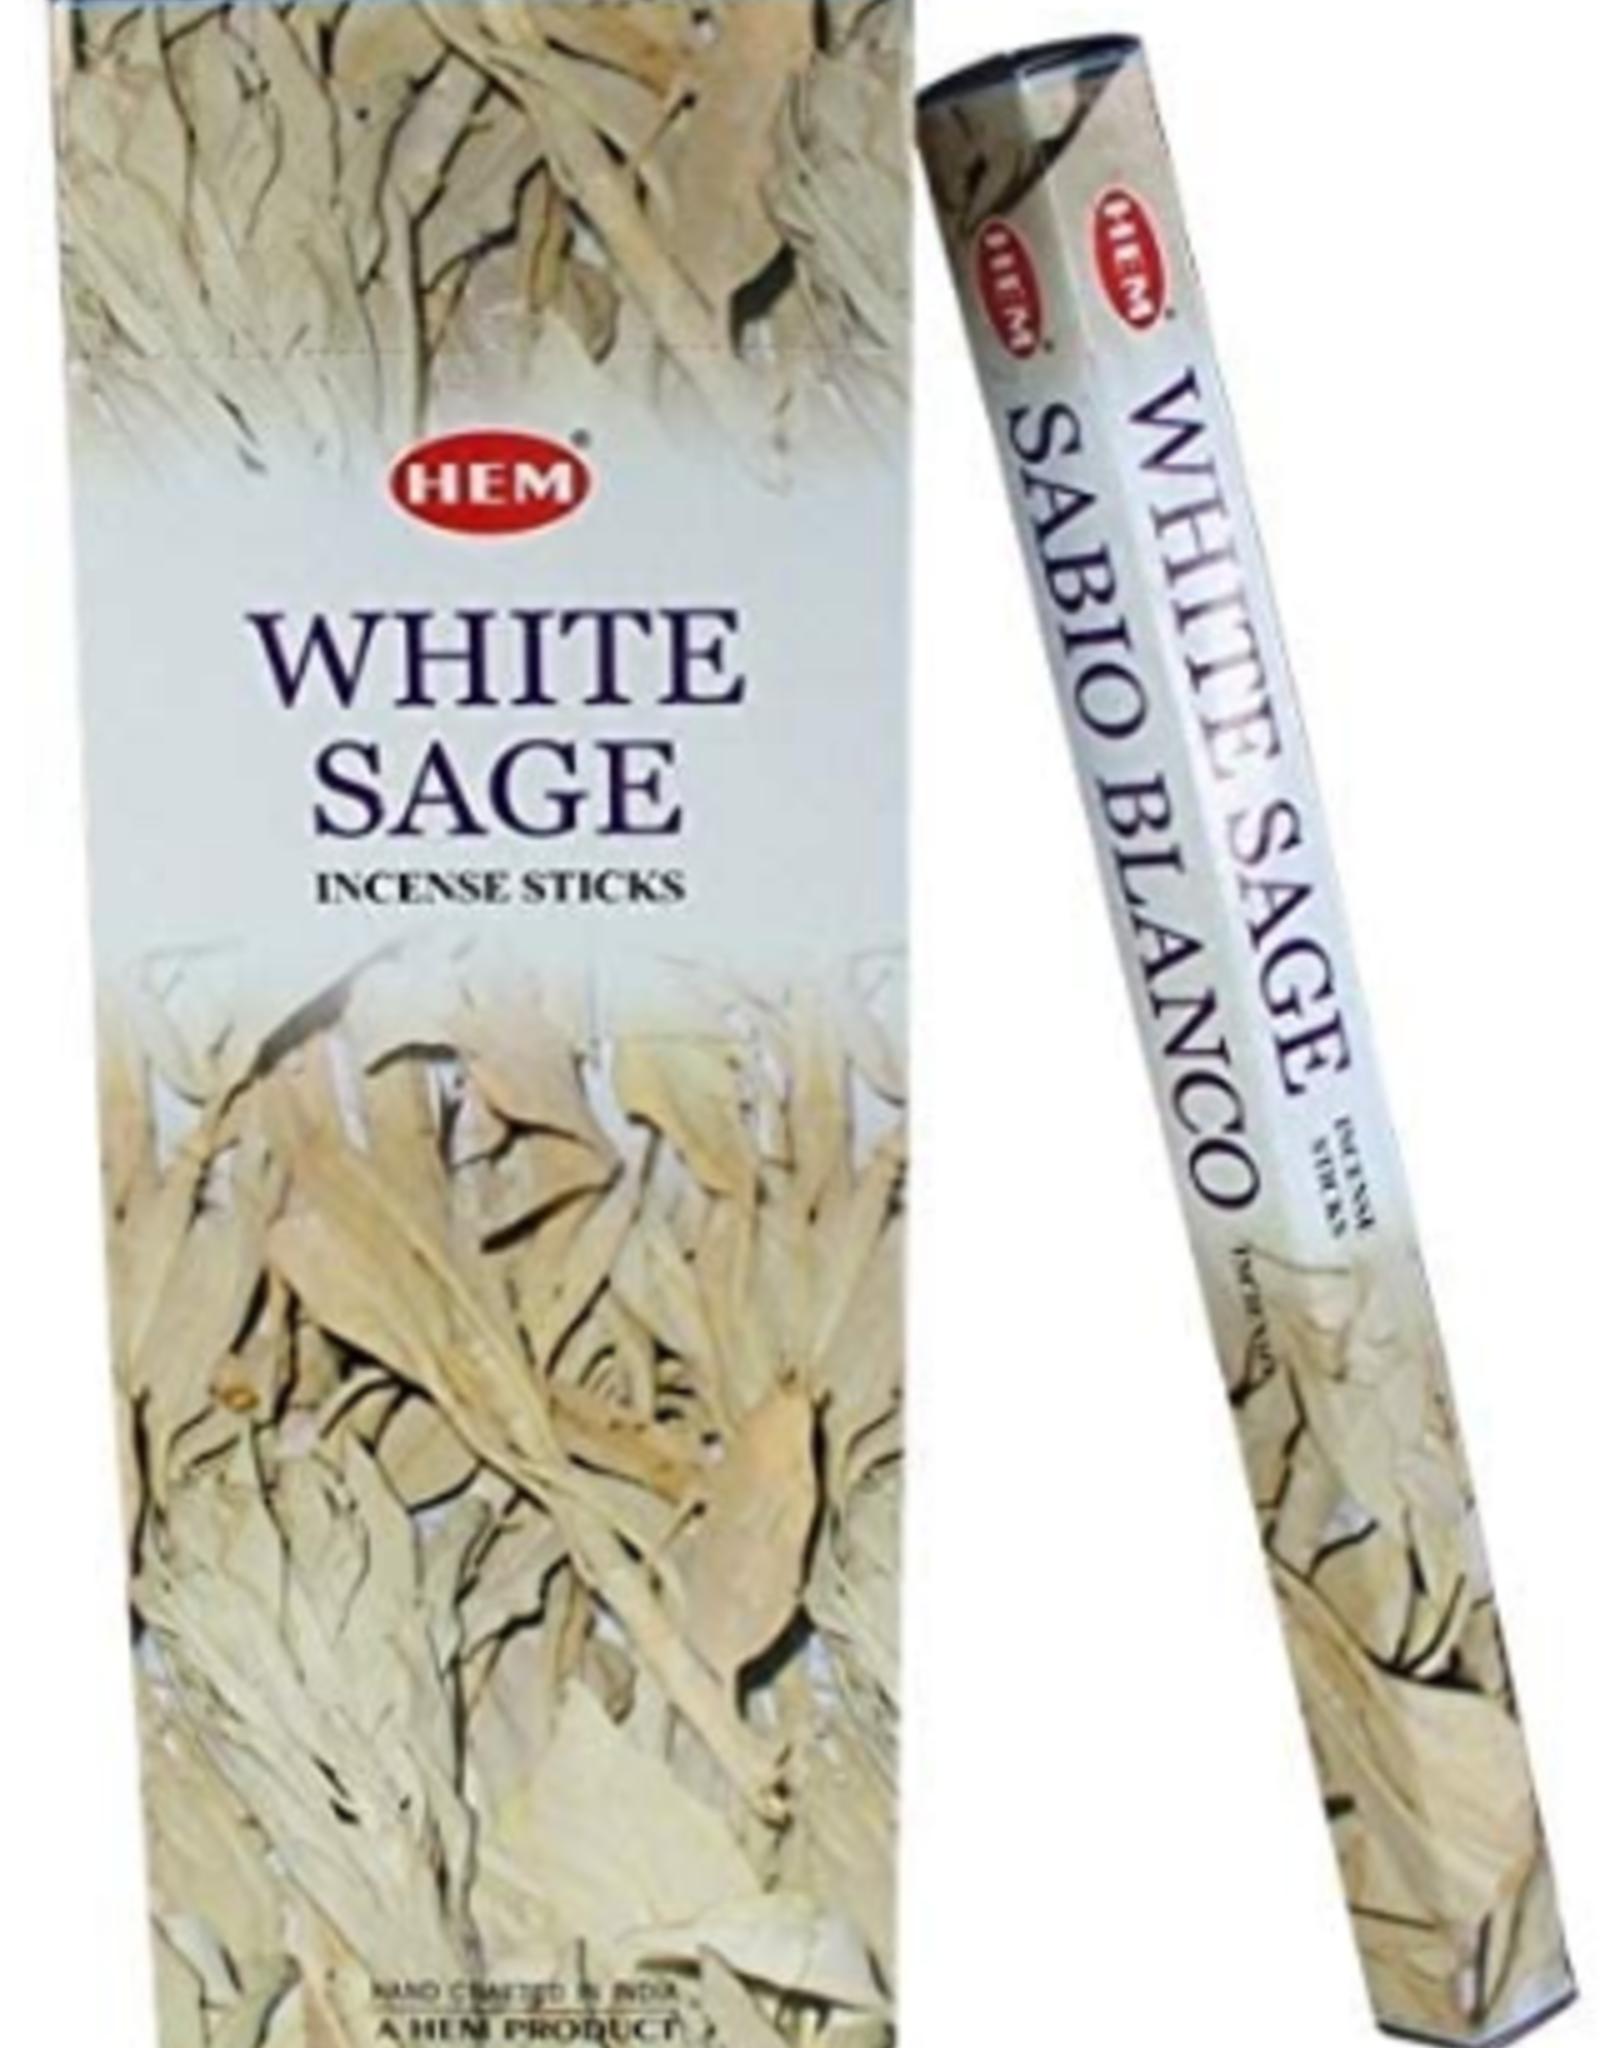 White Sage Incense Sticks (HEM)